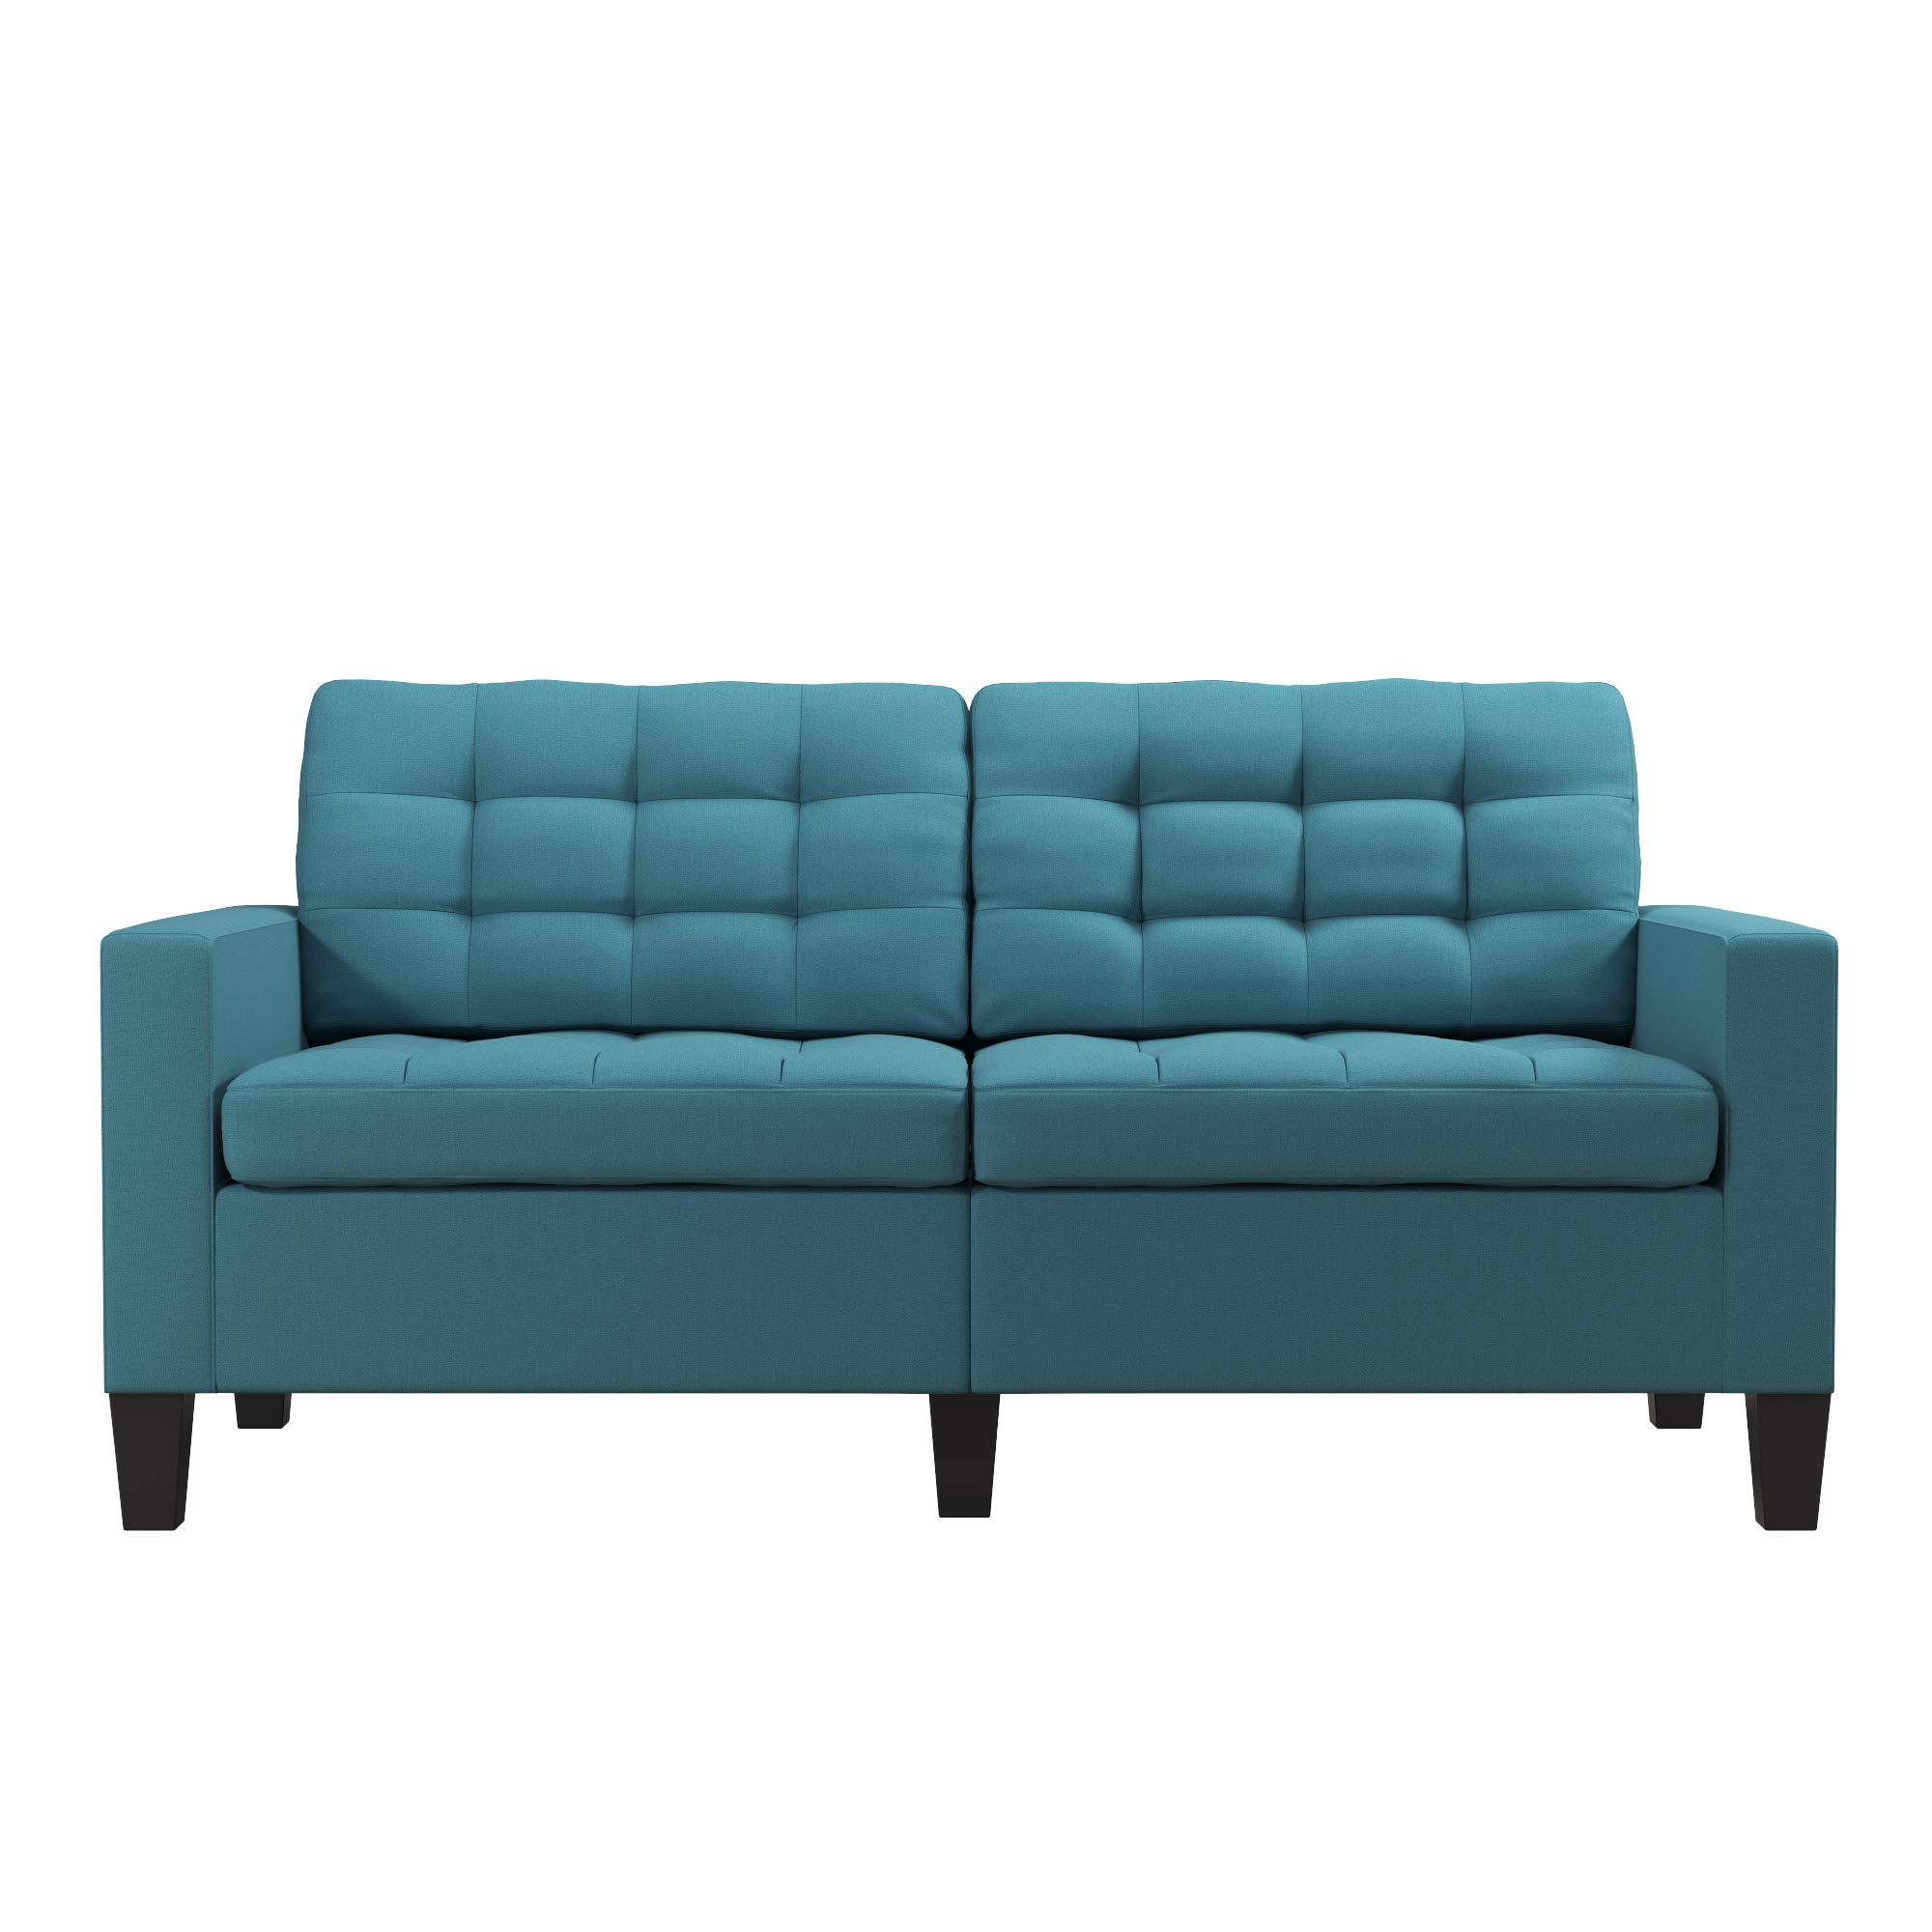 Dorel Living Emily Upholstered Sofa Couch Living Room Furniture, Teal